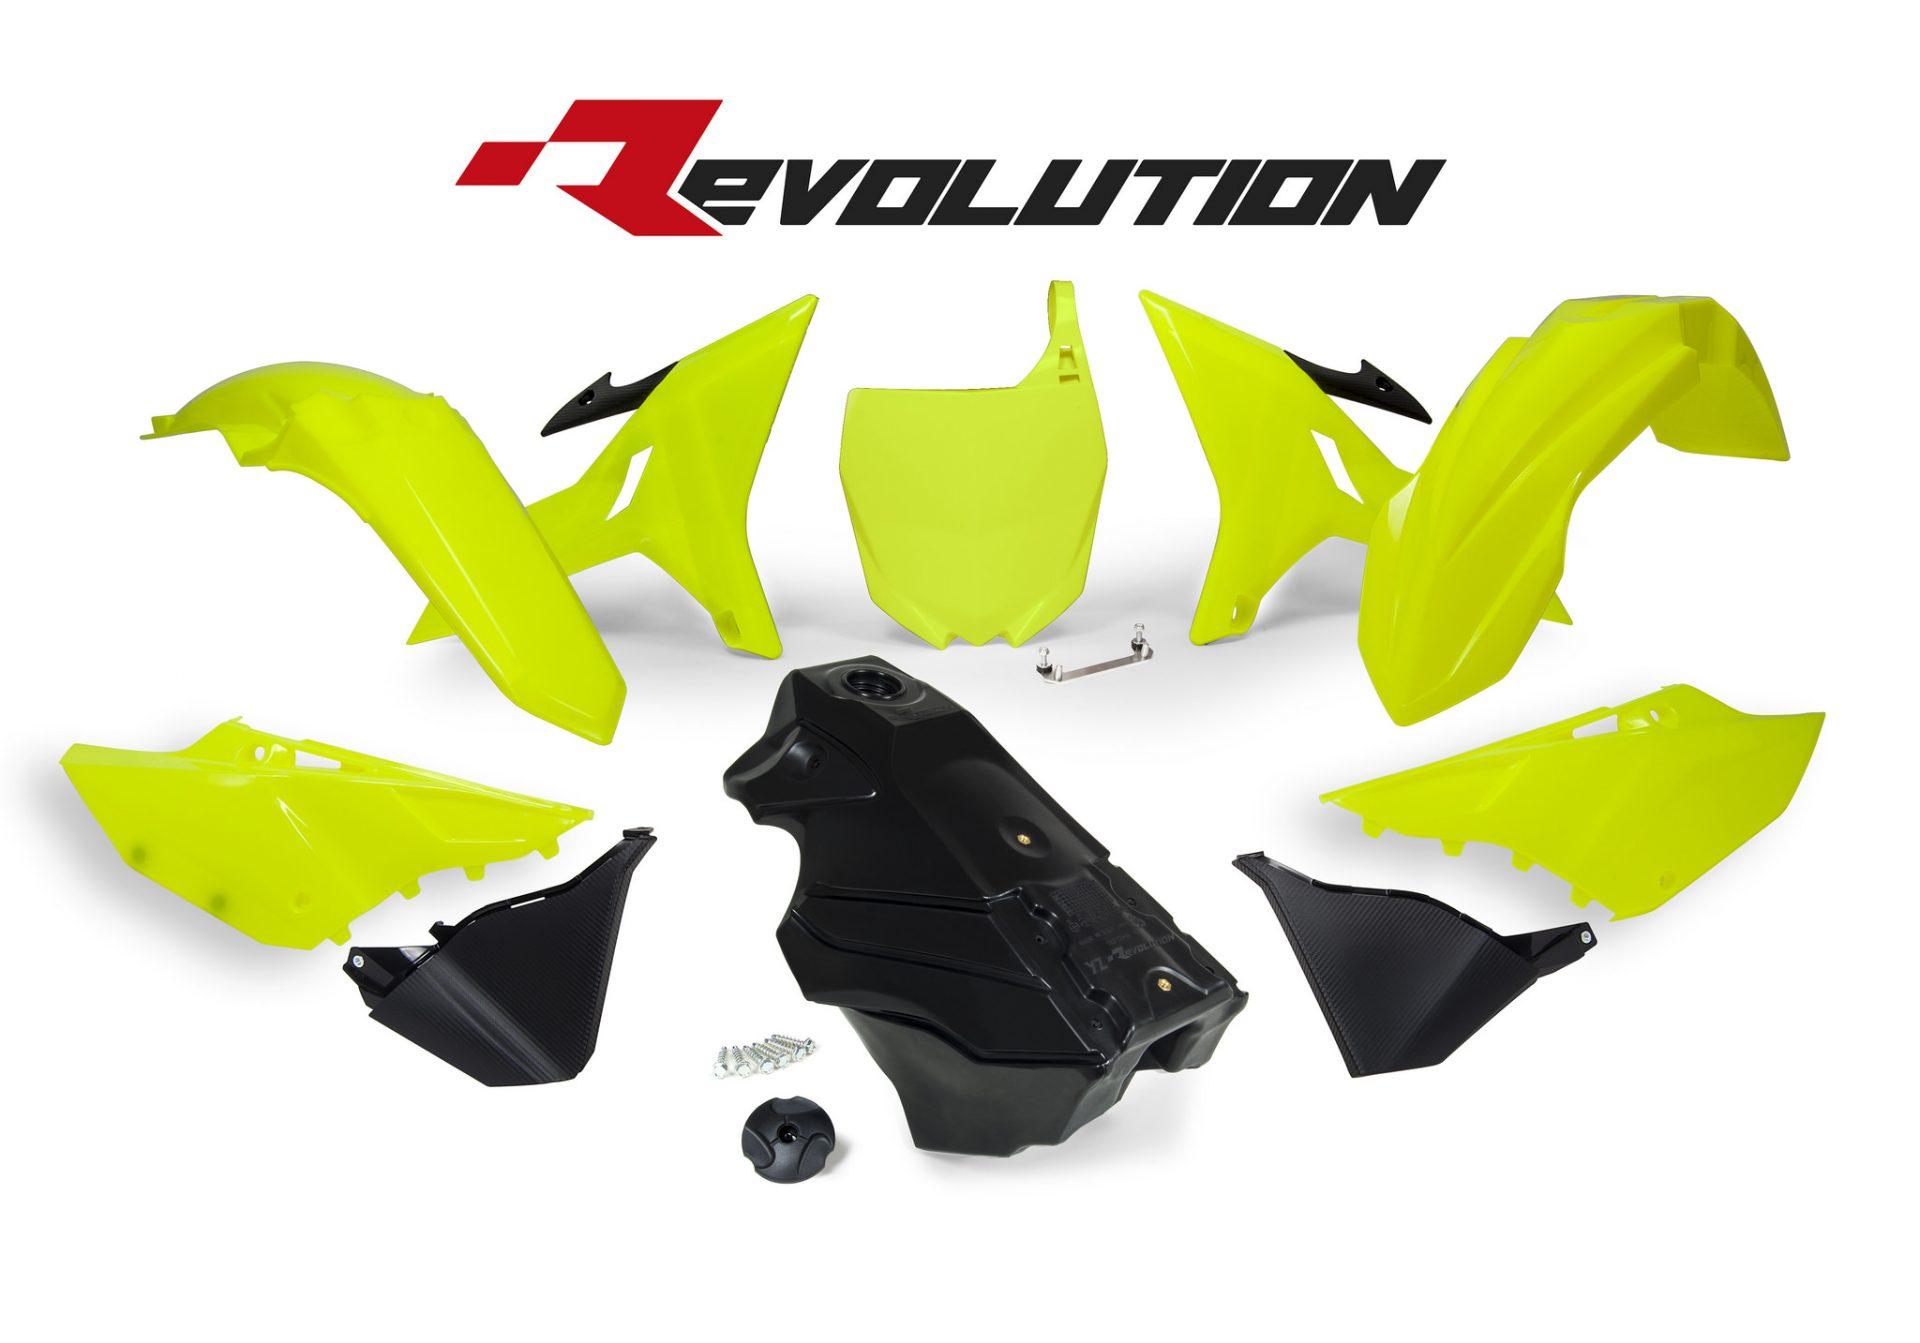 Neon yellow kit rival ink design co custom motocross graphics - Rtech Revolution Neon Yellow Yz Plastics Kit Including Tank